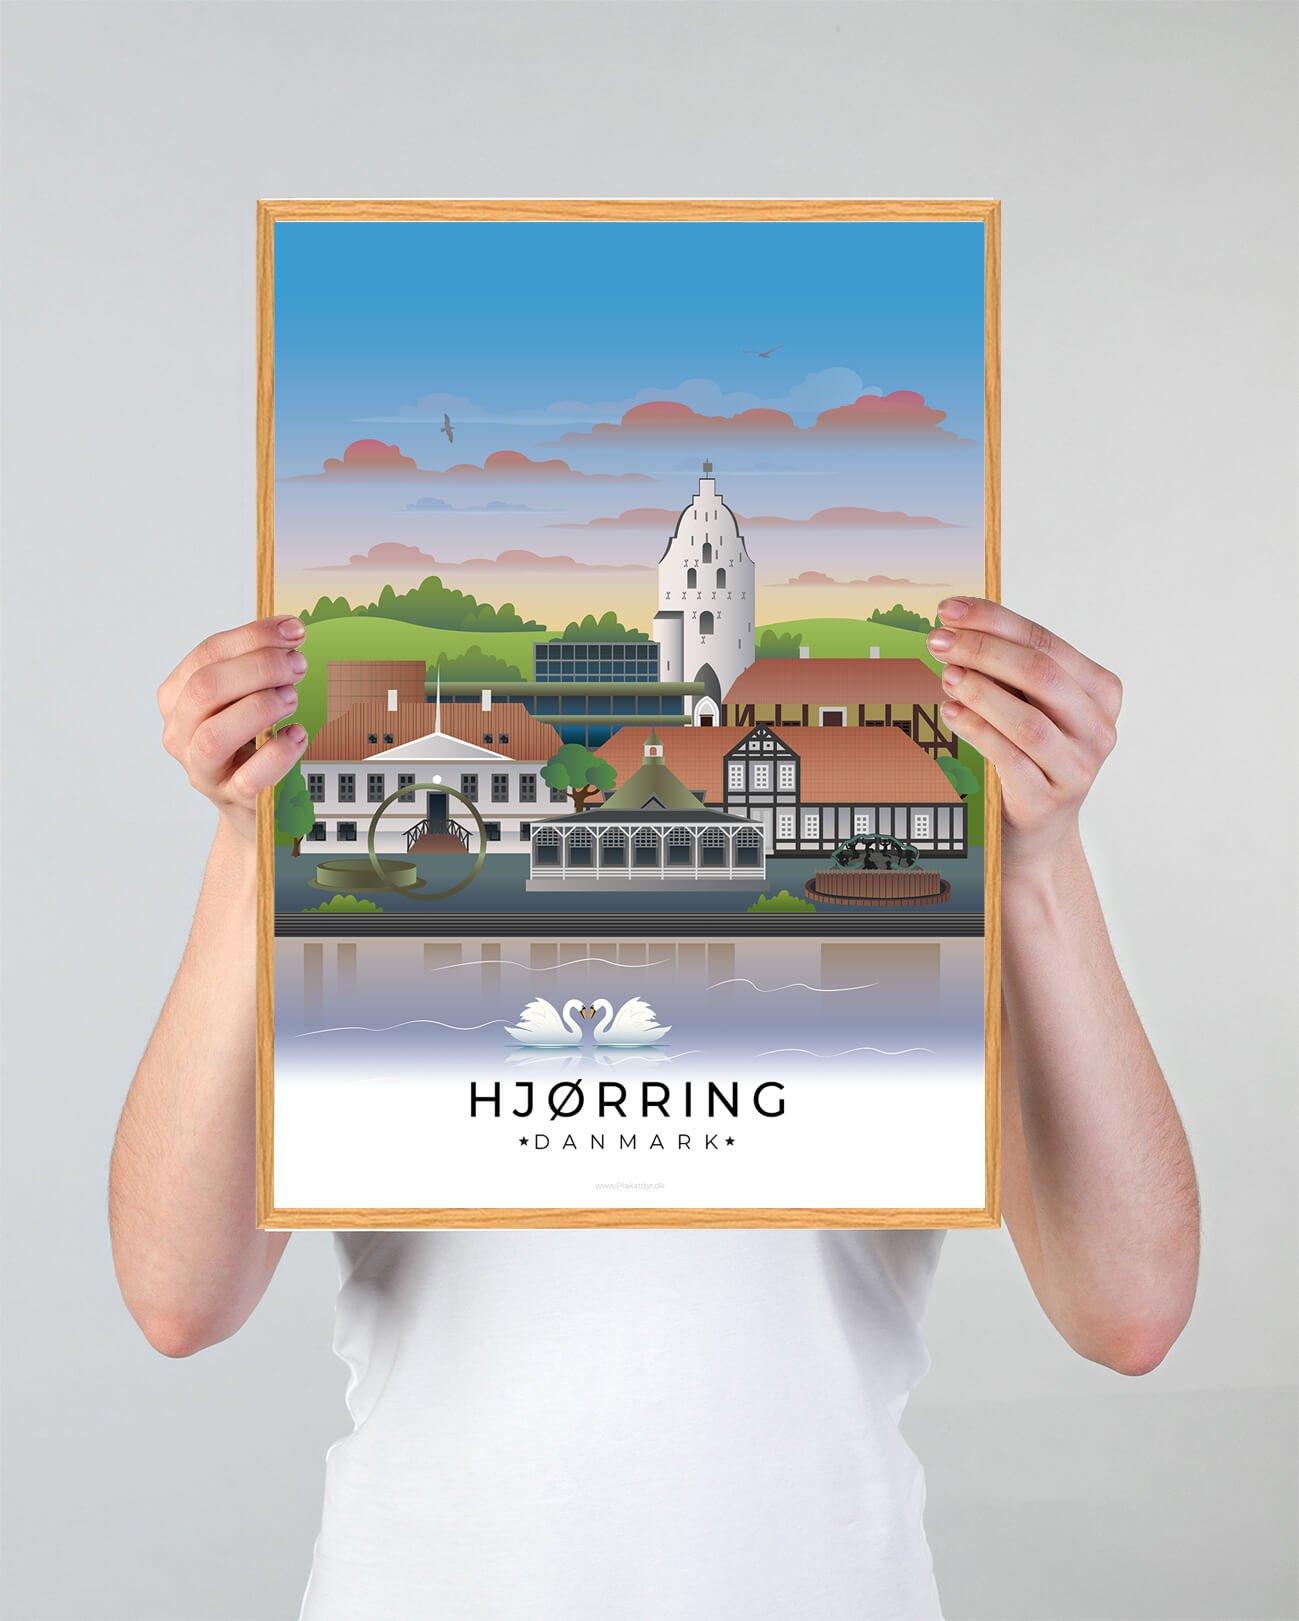 Hjoerring-plakat-boligen-2